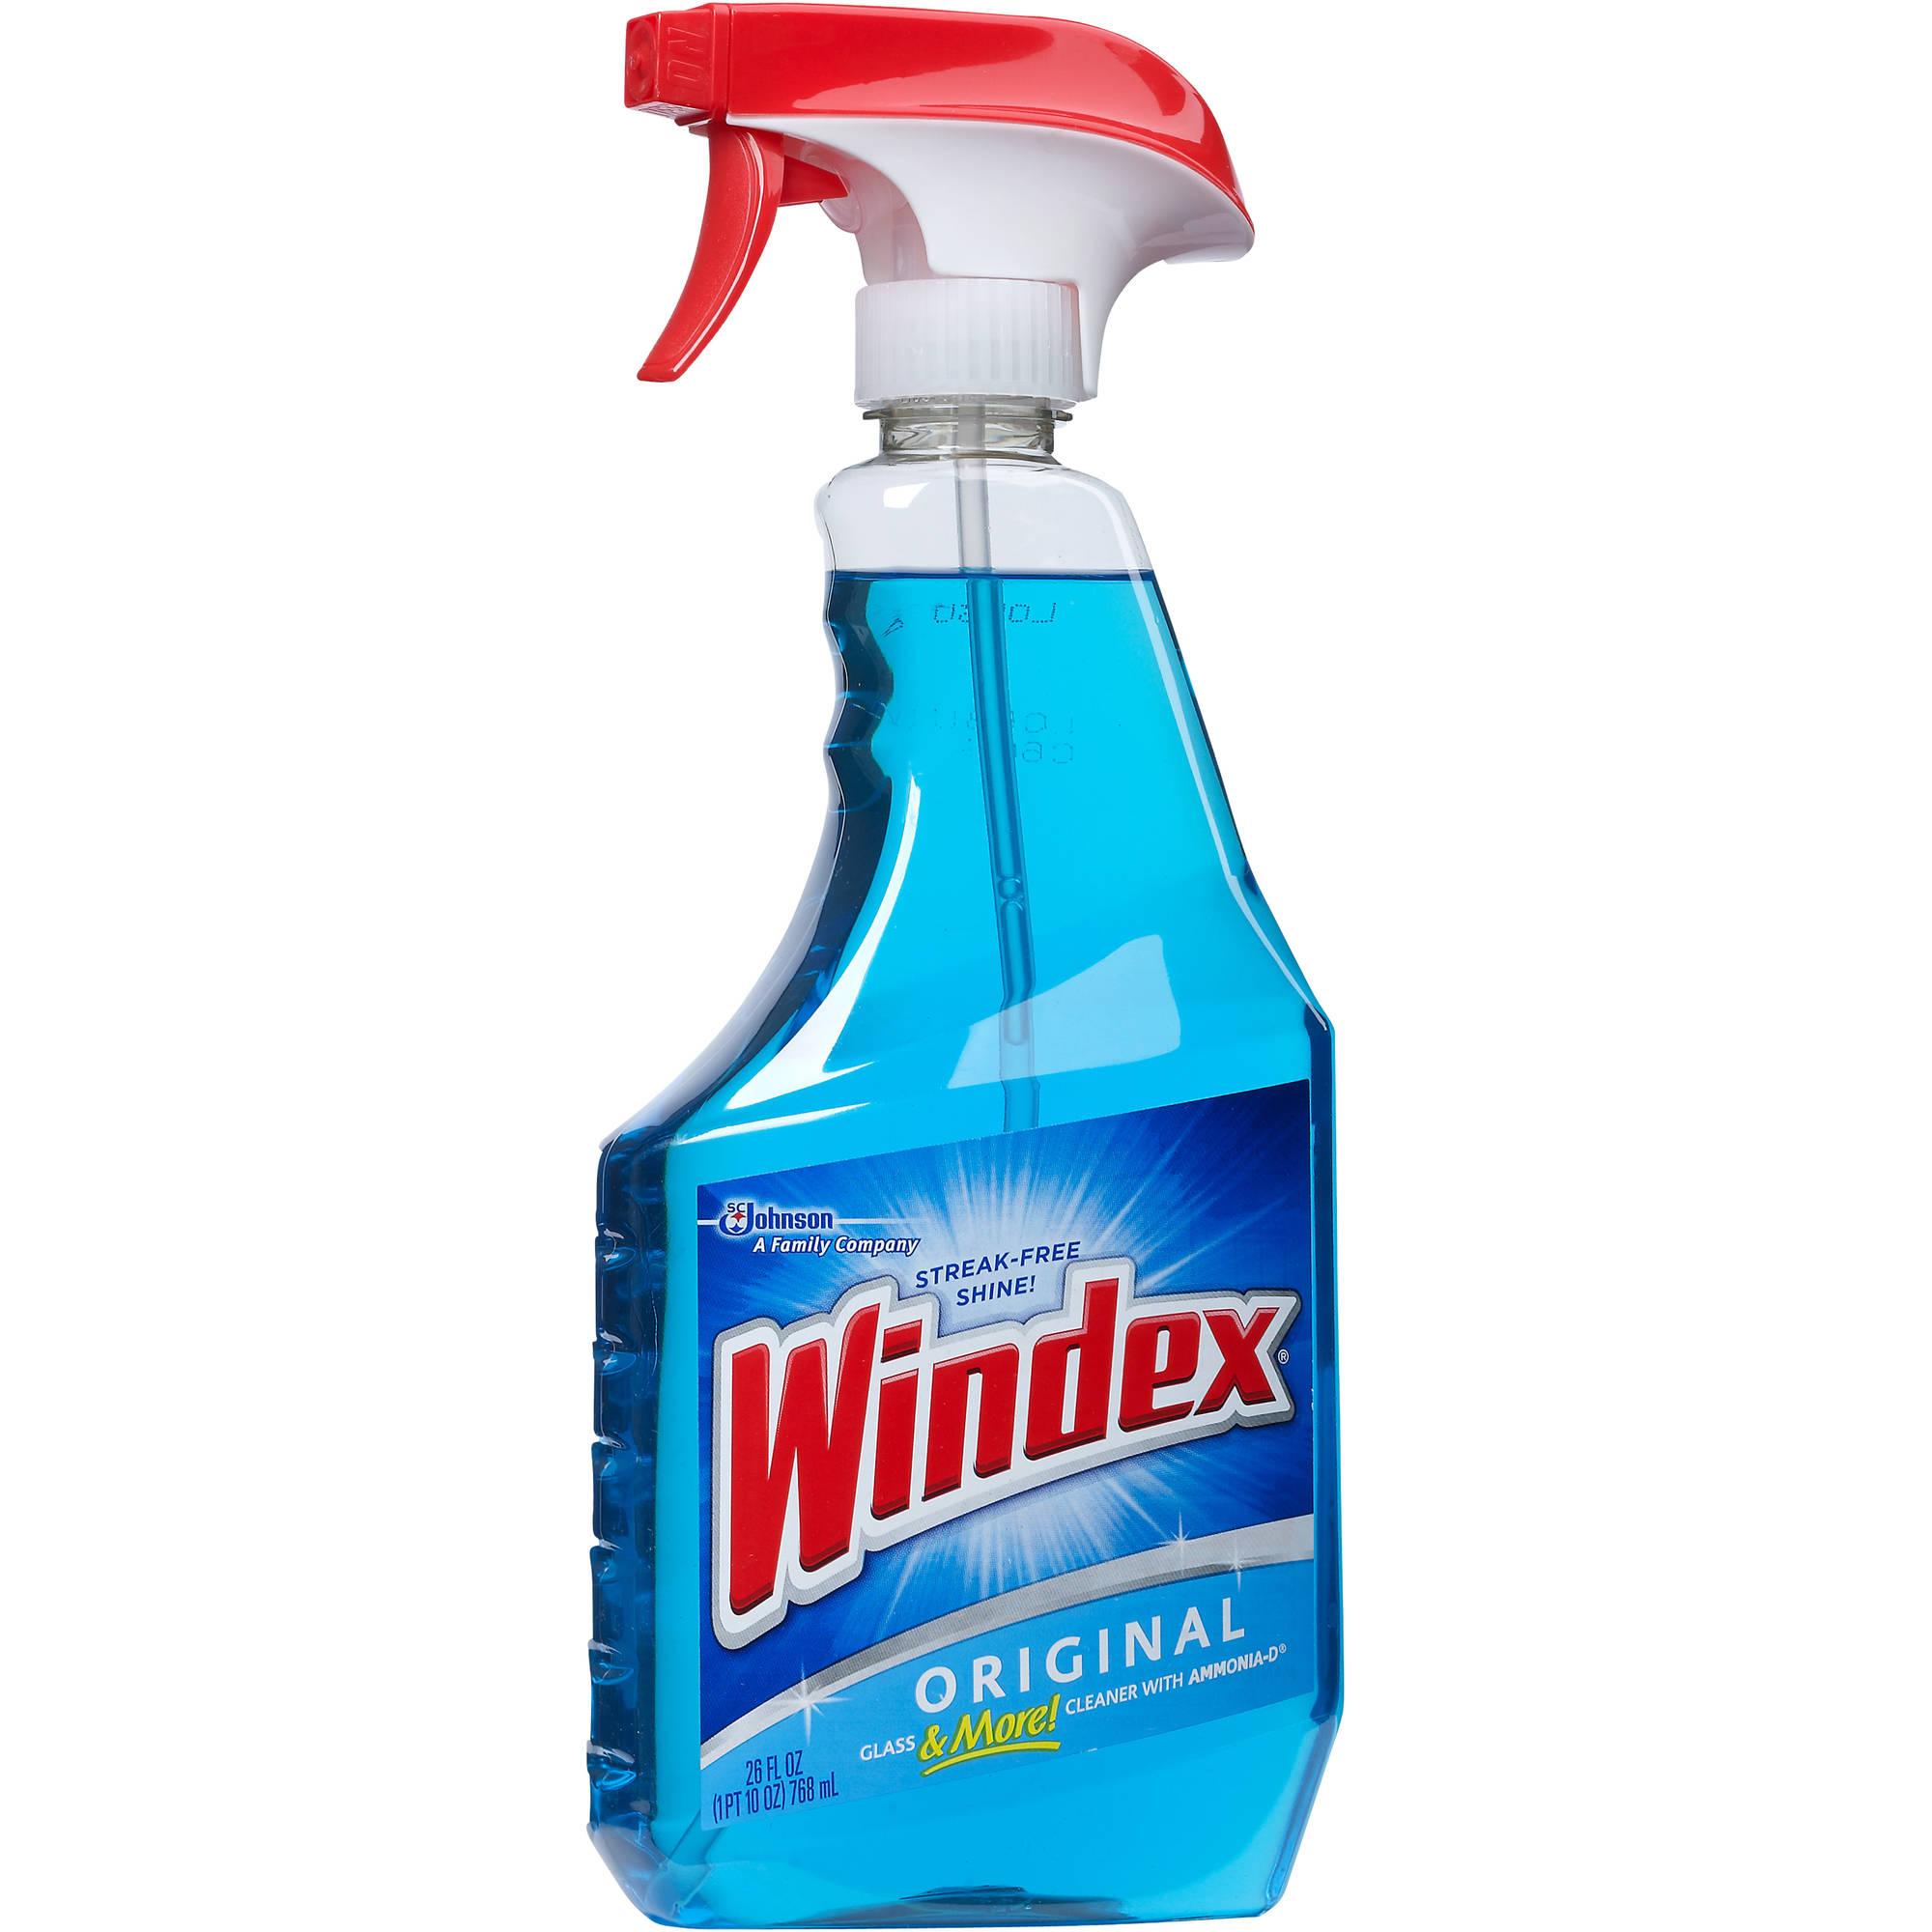 Windex Original Glass Cleaner, 26 fl oz - Walmart.com